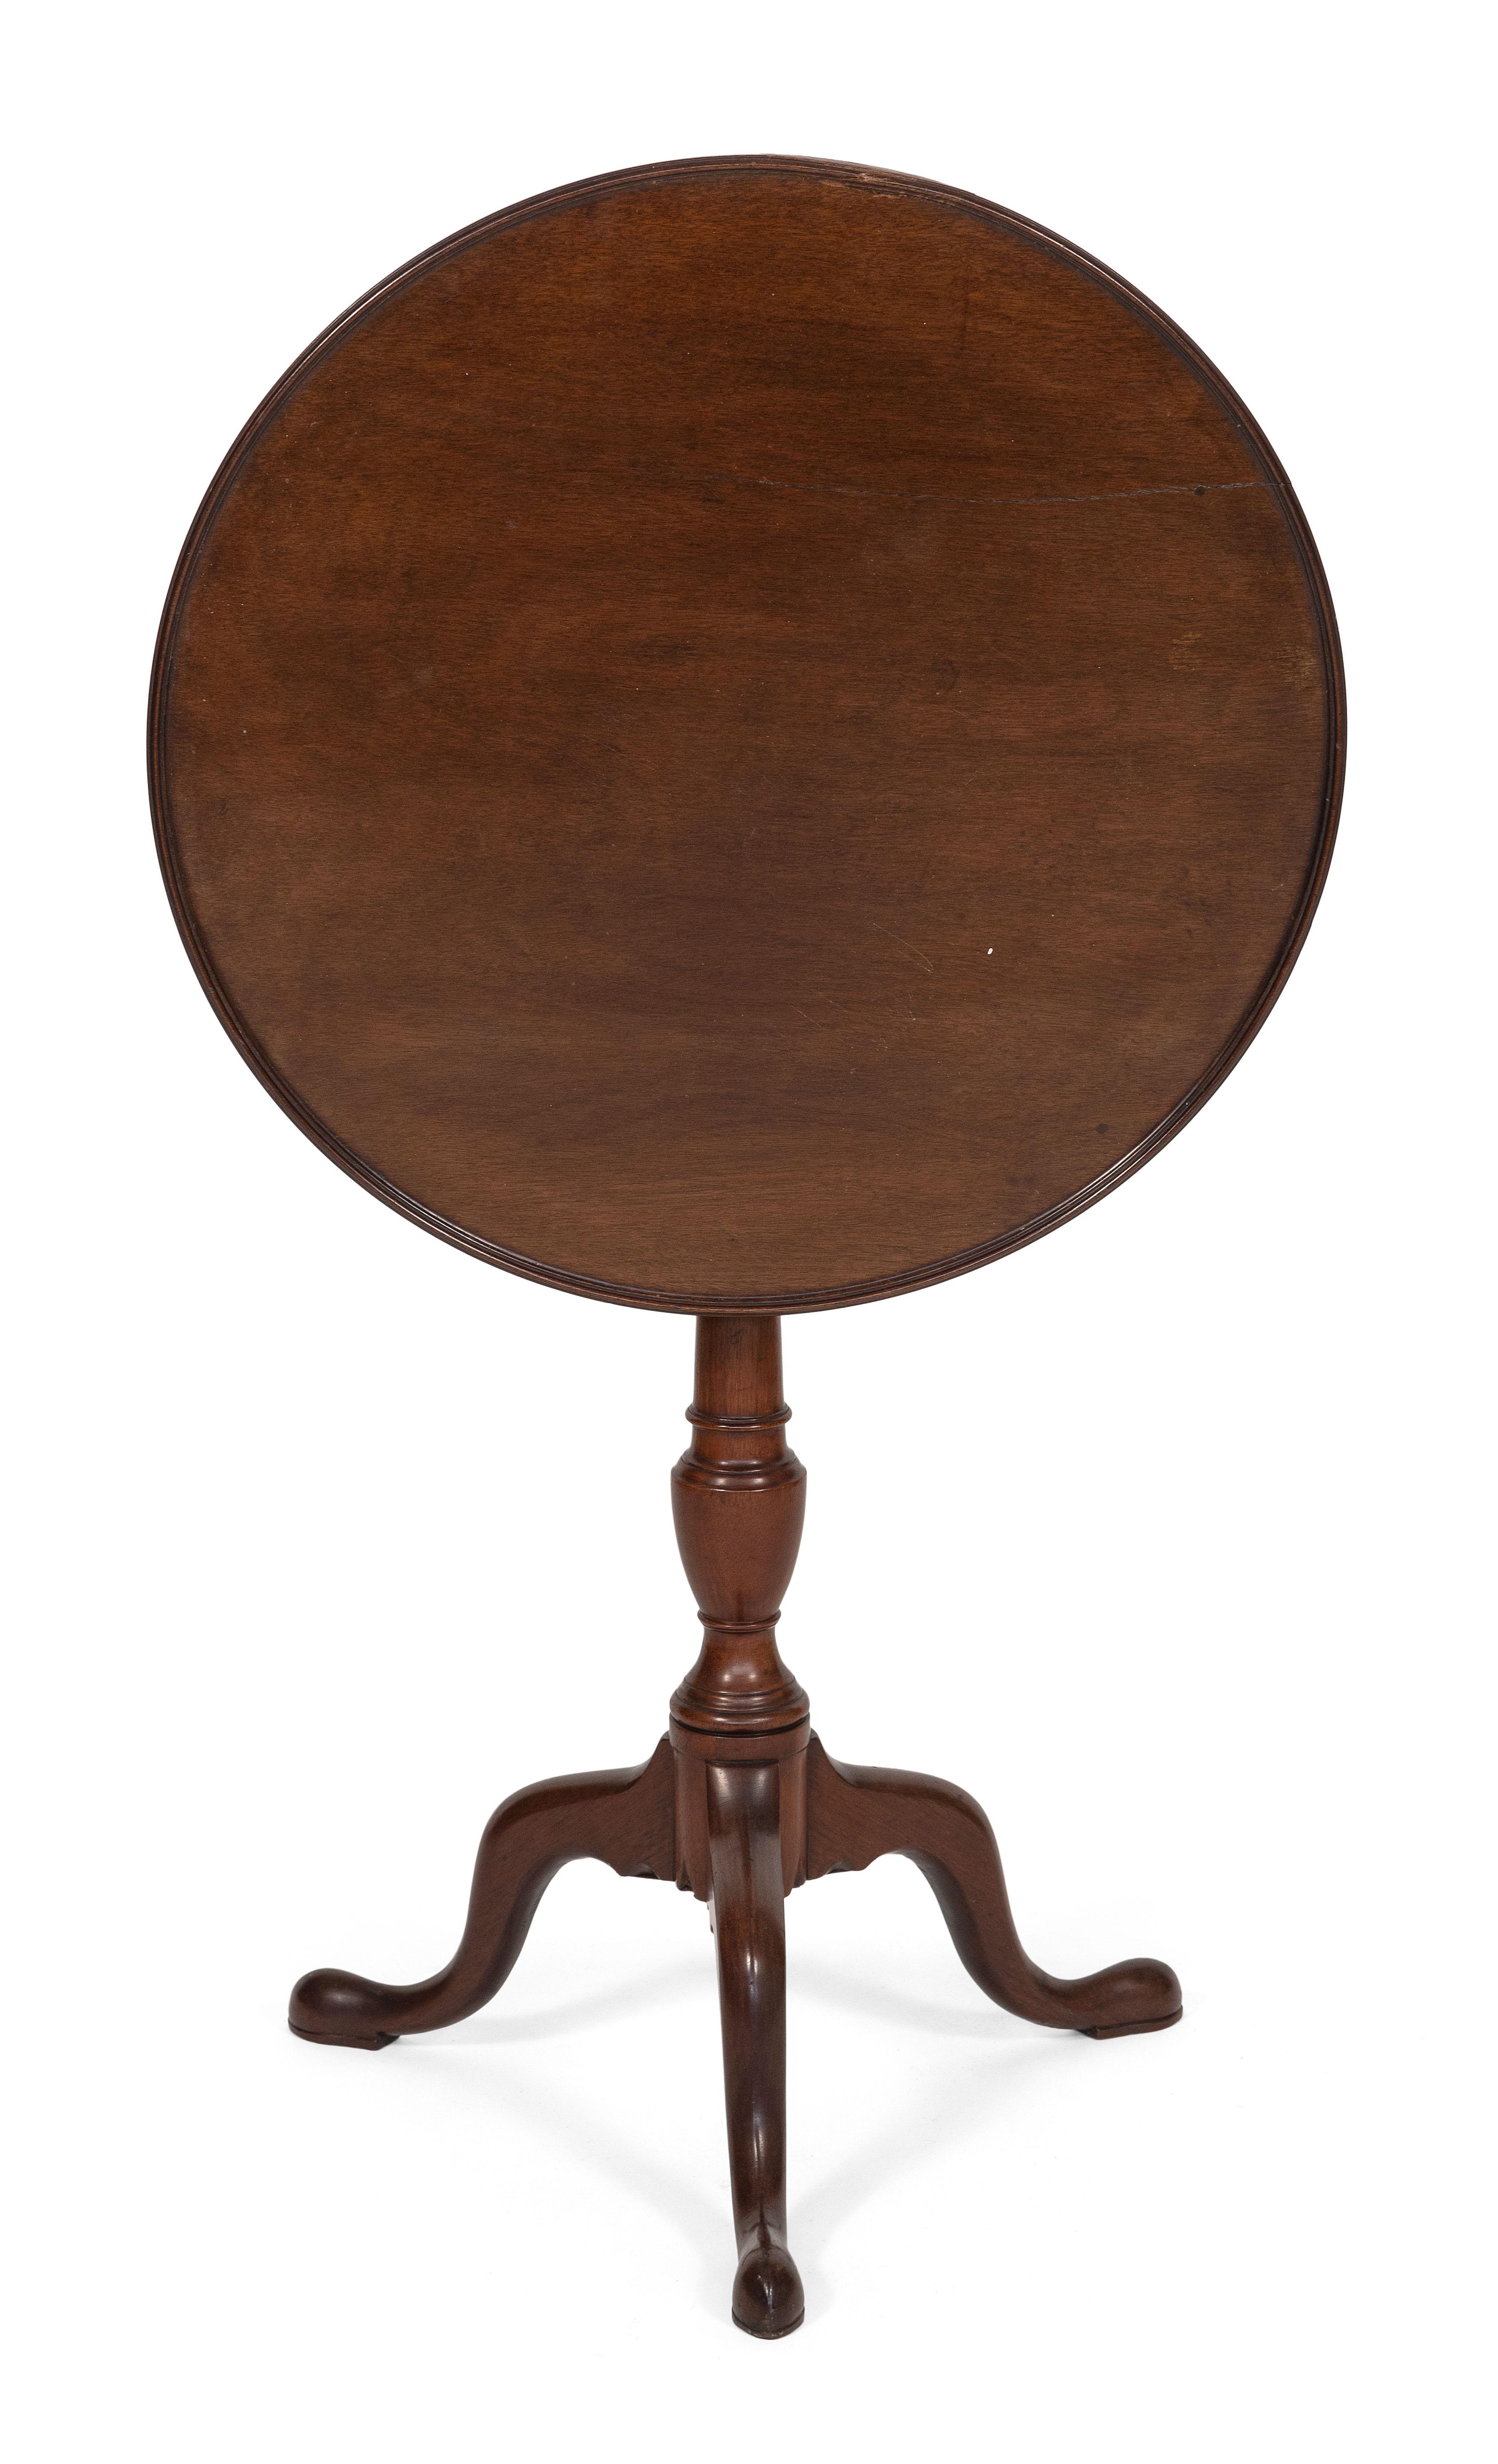 QUEEN ANNE BIRDCAGE TILT-TOP TABLE Massachusetts, Last Half of the 18th Century Height 27.75